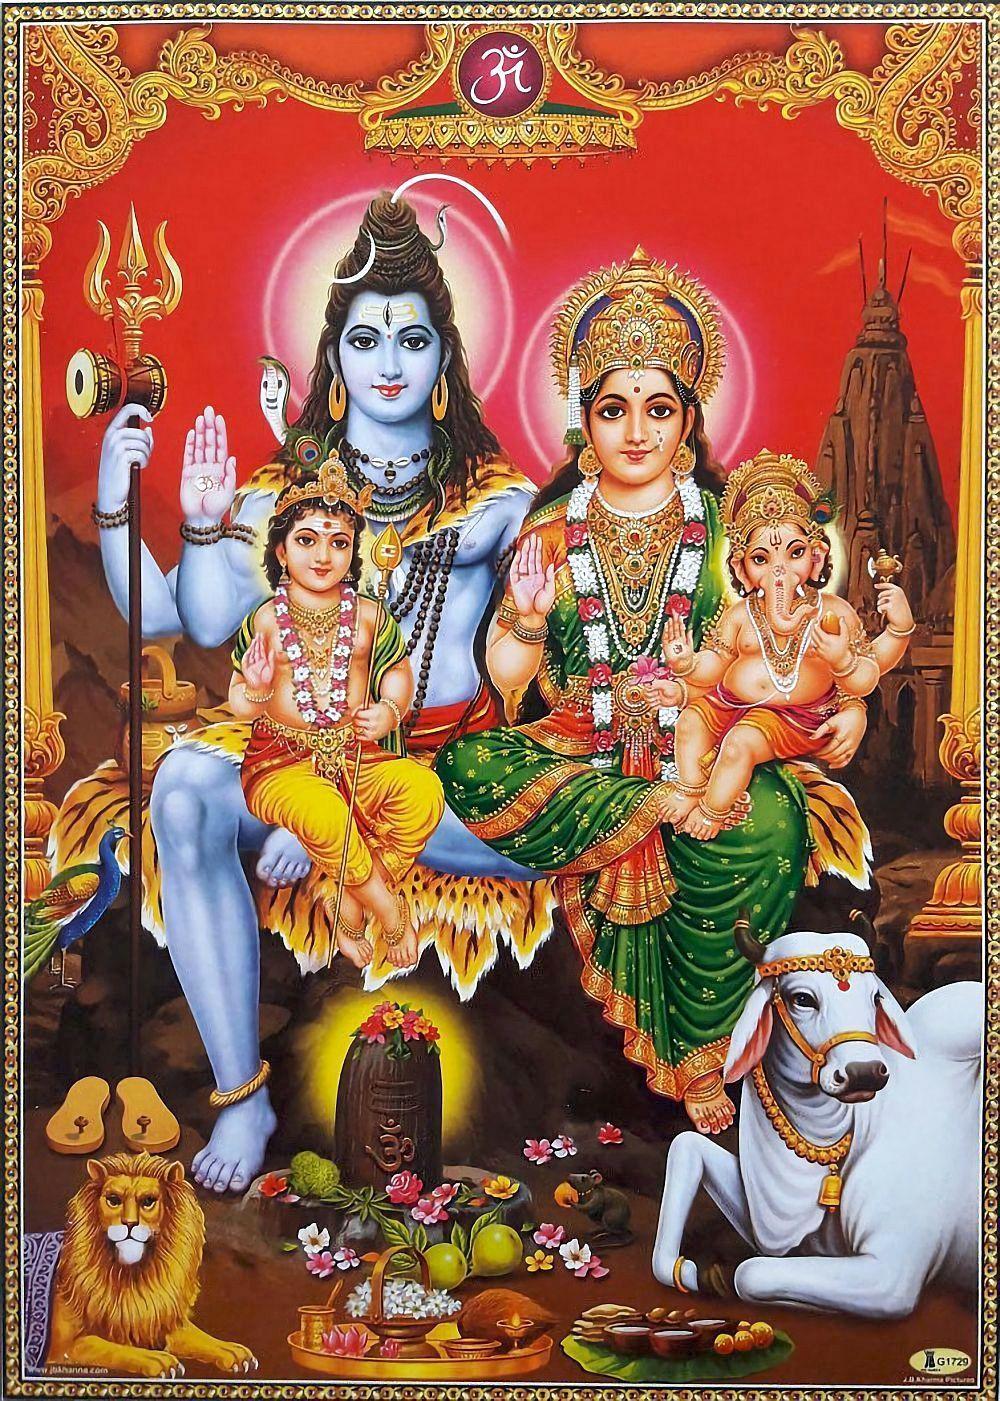 Shiva With His Family Parvati Ganesha Murugan Via Ebay Indian Ash Lord Shiva Family Lord Shiva Hd Images Lord Shiva